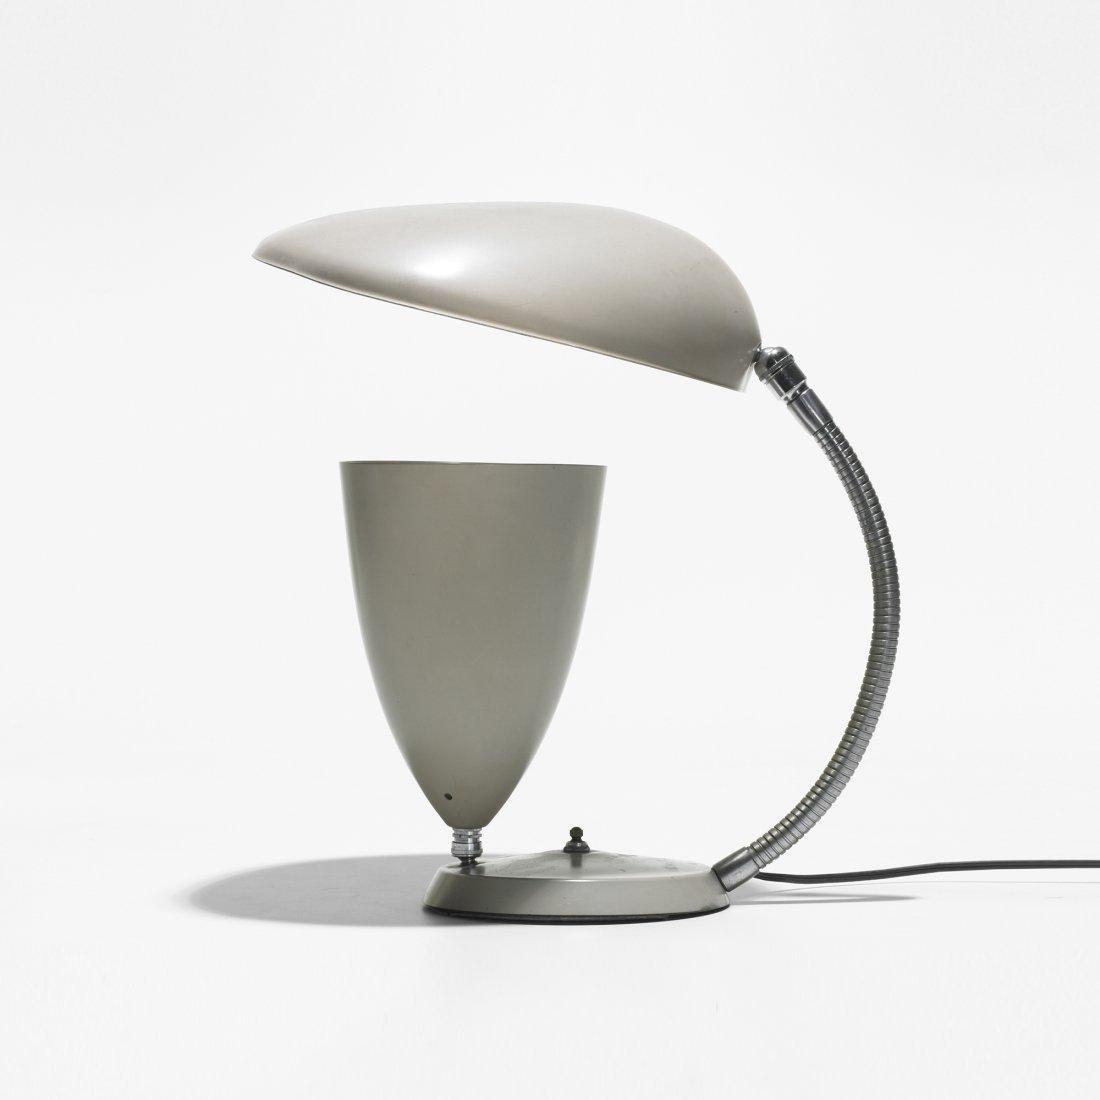 100: Greta  Magnusson Grossman table lamp